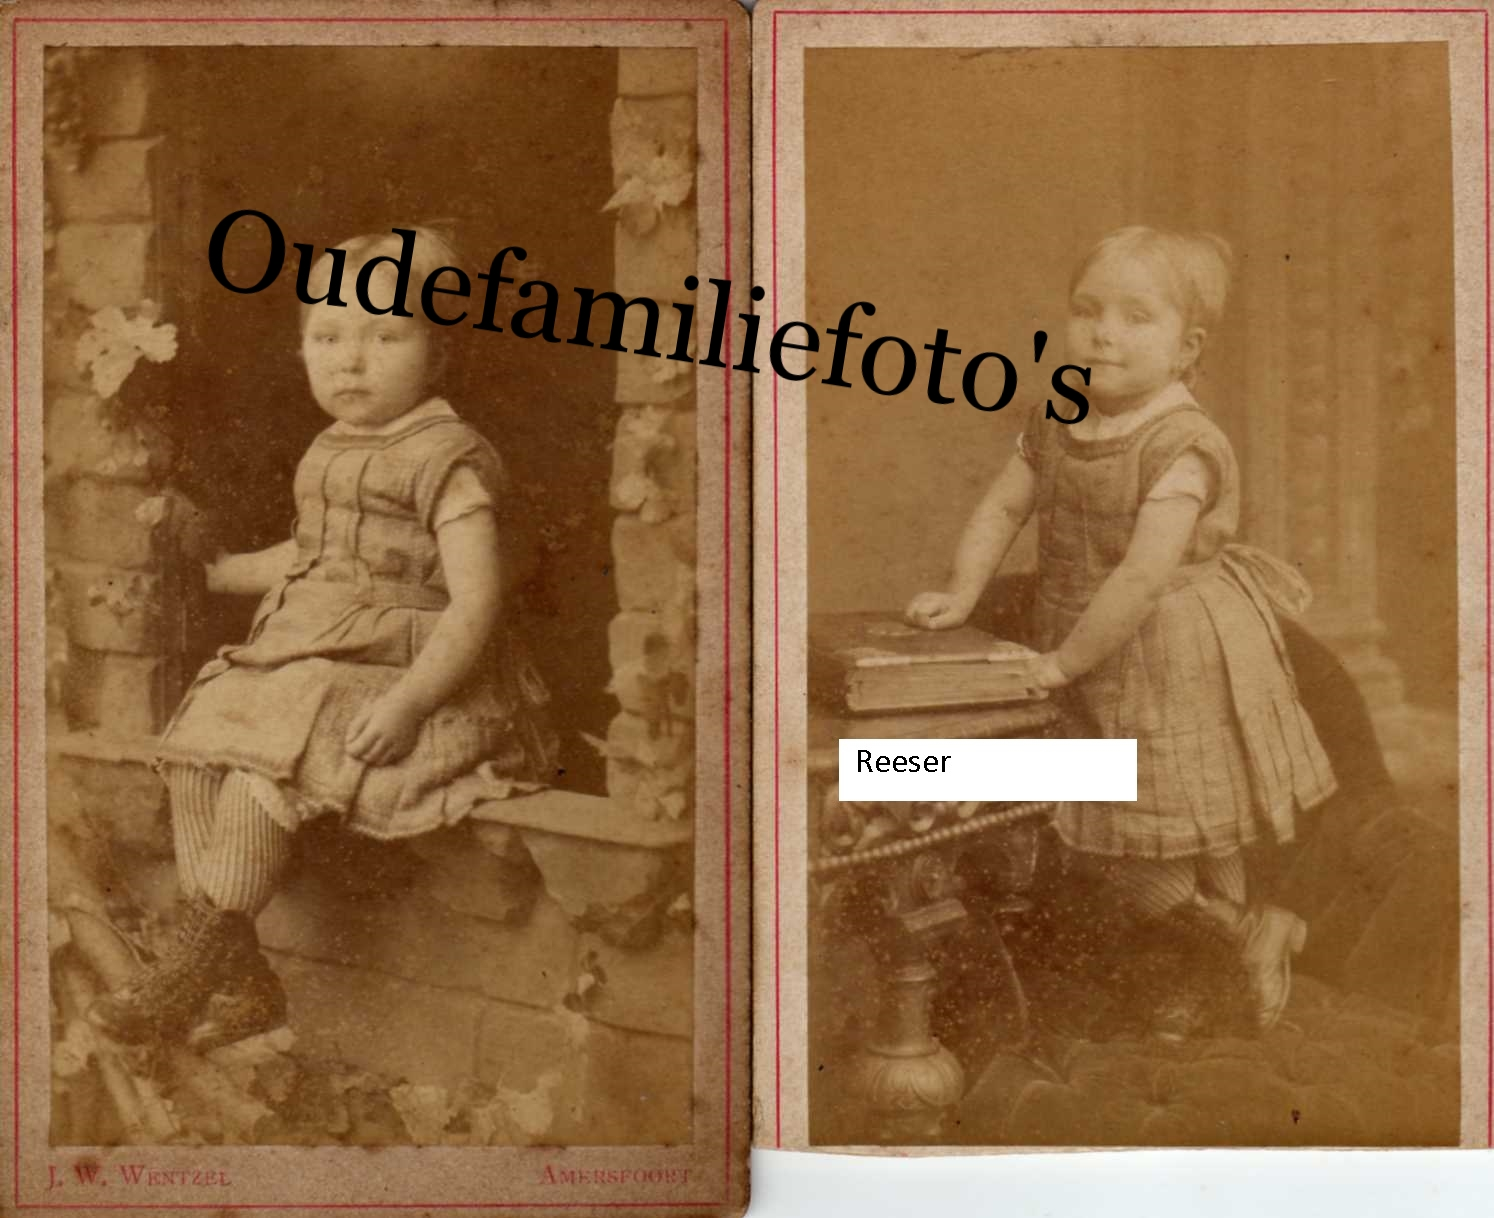 Reeser, Hendrika Wilhelmina Geb. 29-10-1881 Amersfoort Ovl. 18-8-1948 Leeuwarden. Getrouwd met A.M Harterink. € 3,00